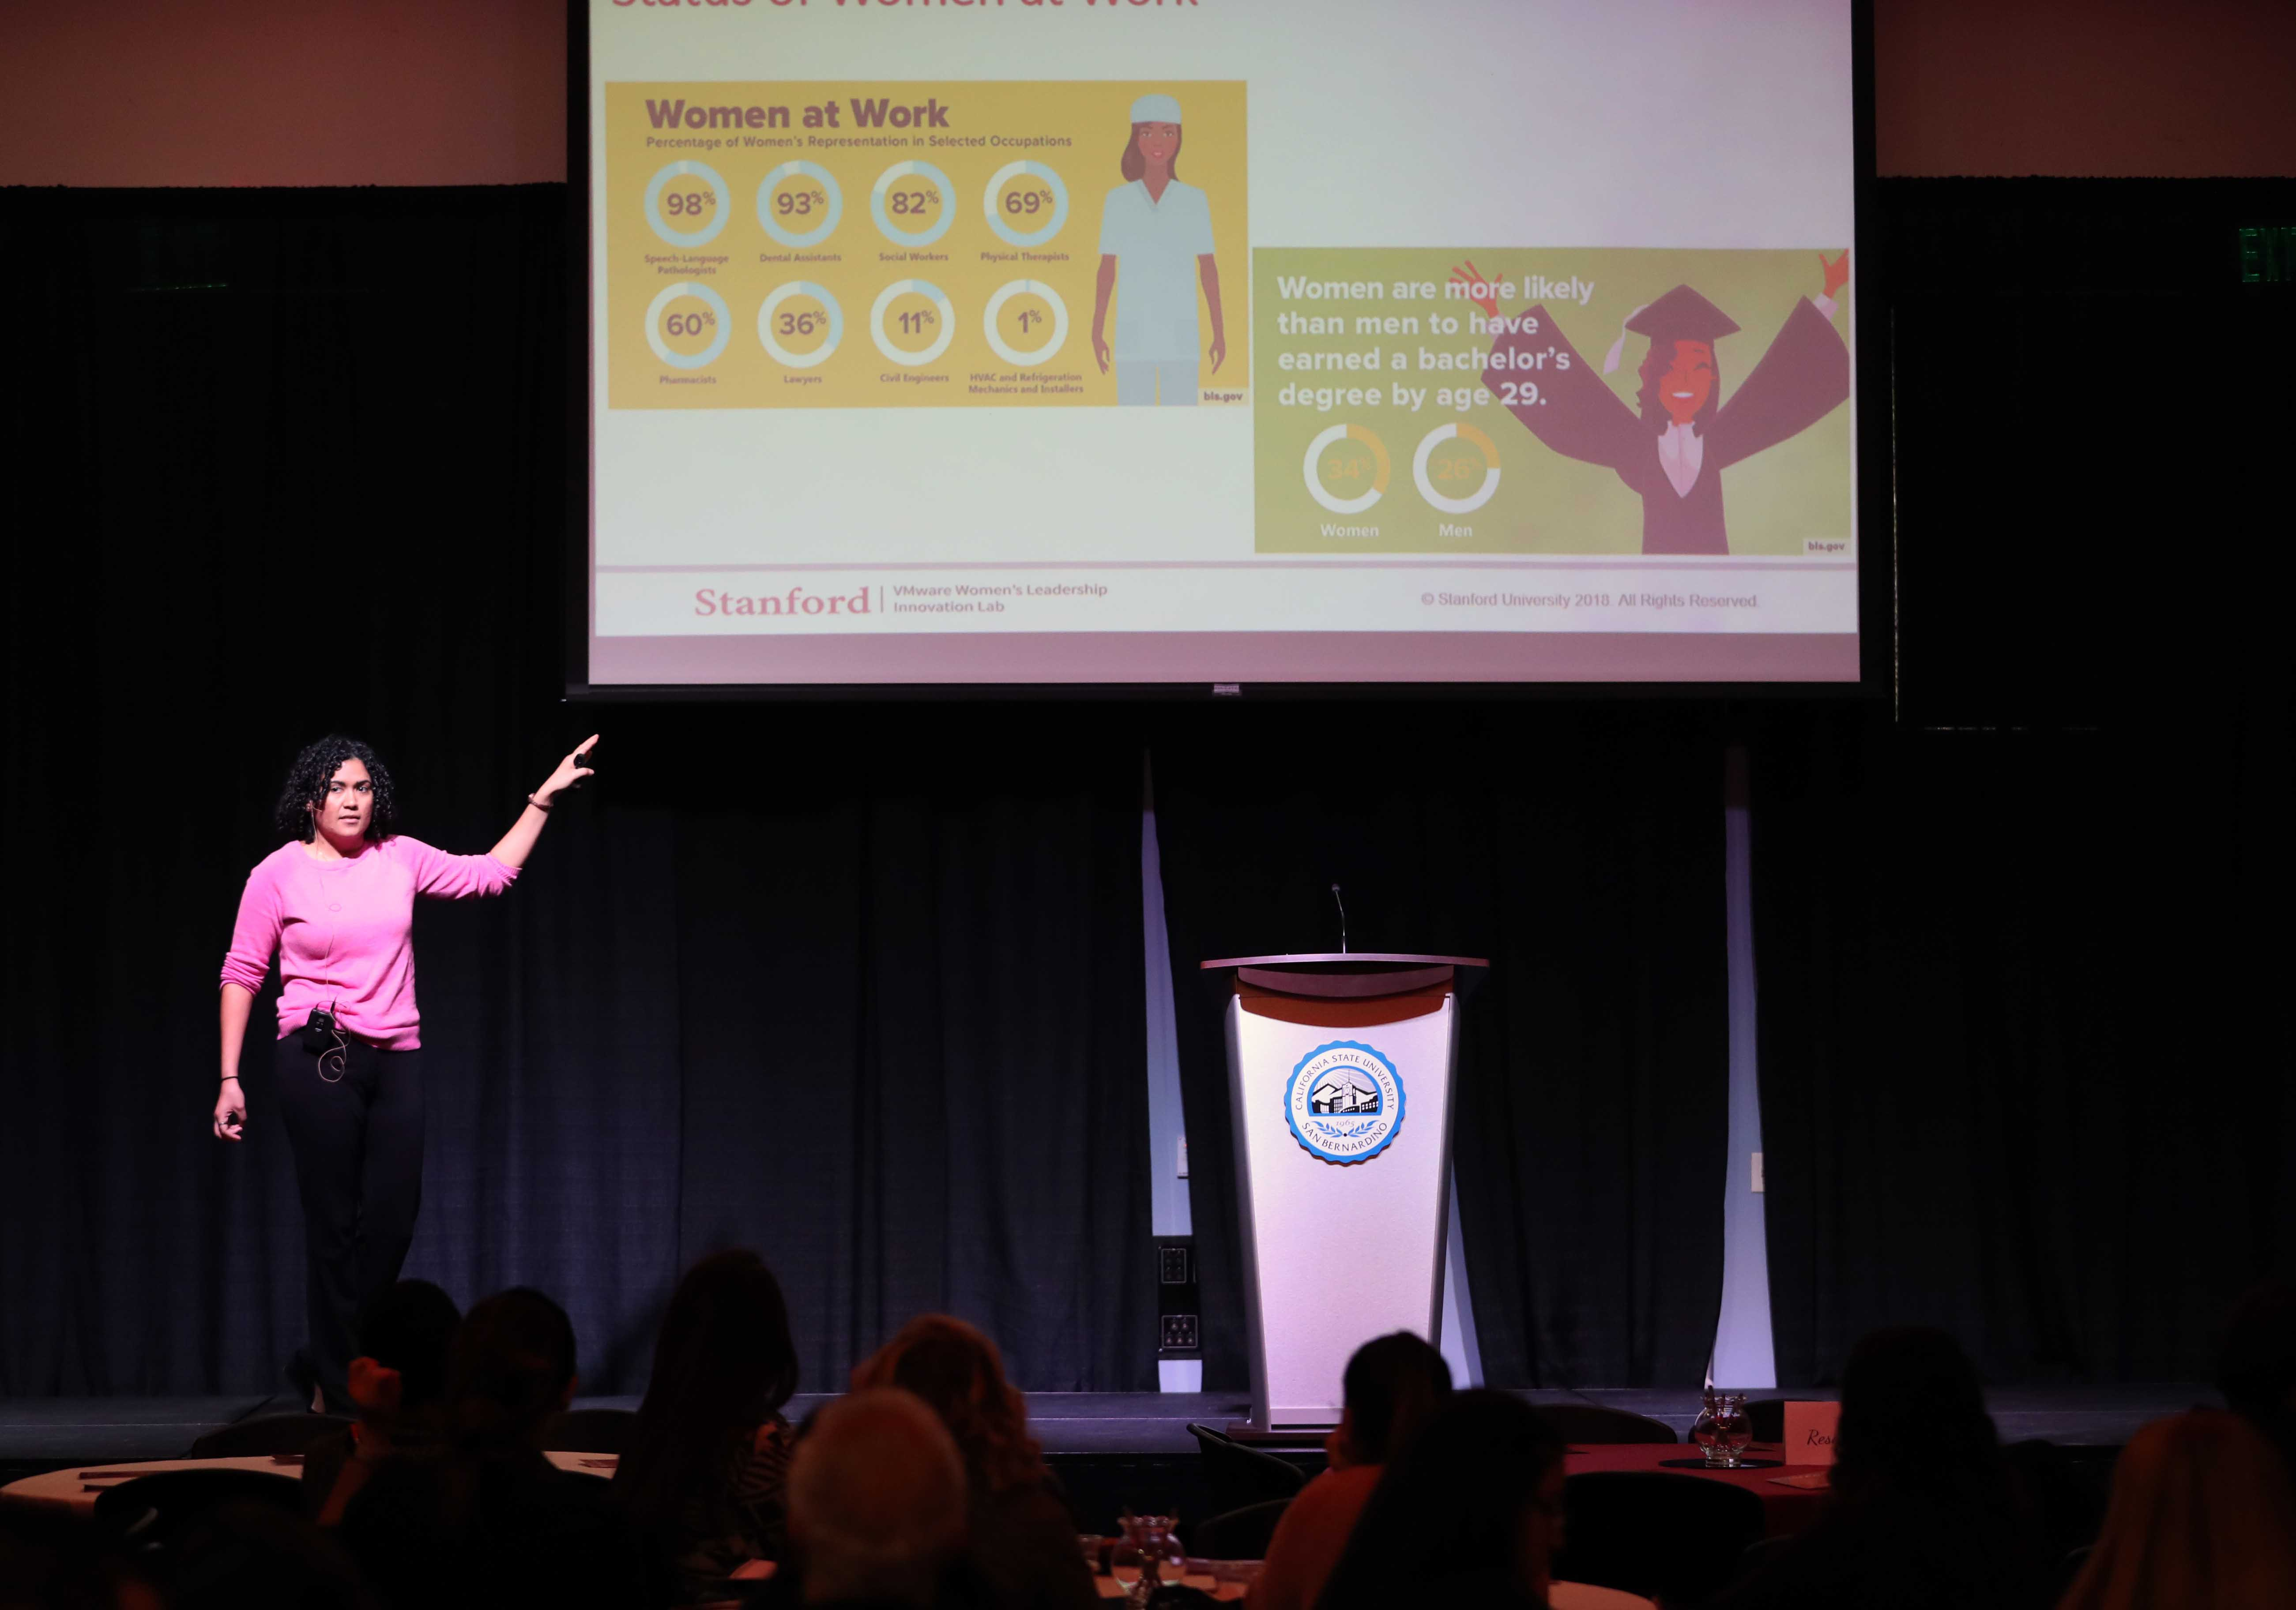 Melissa Abad, a sociologist at the Stanford VMware Women's Leadership Innovation Lab gave the morning keynote presentation.